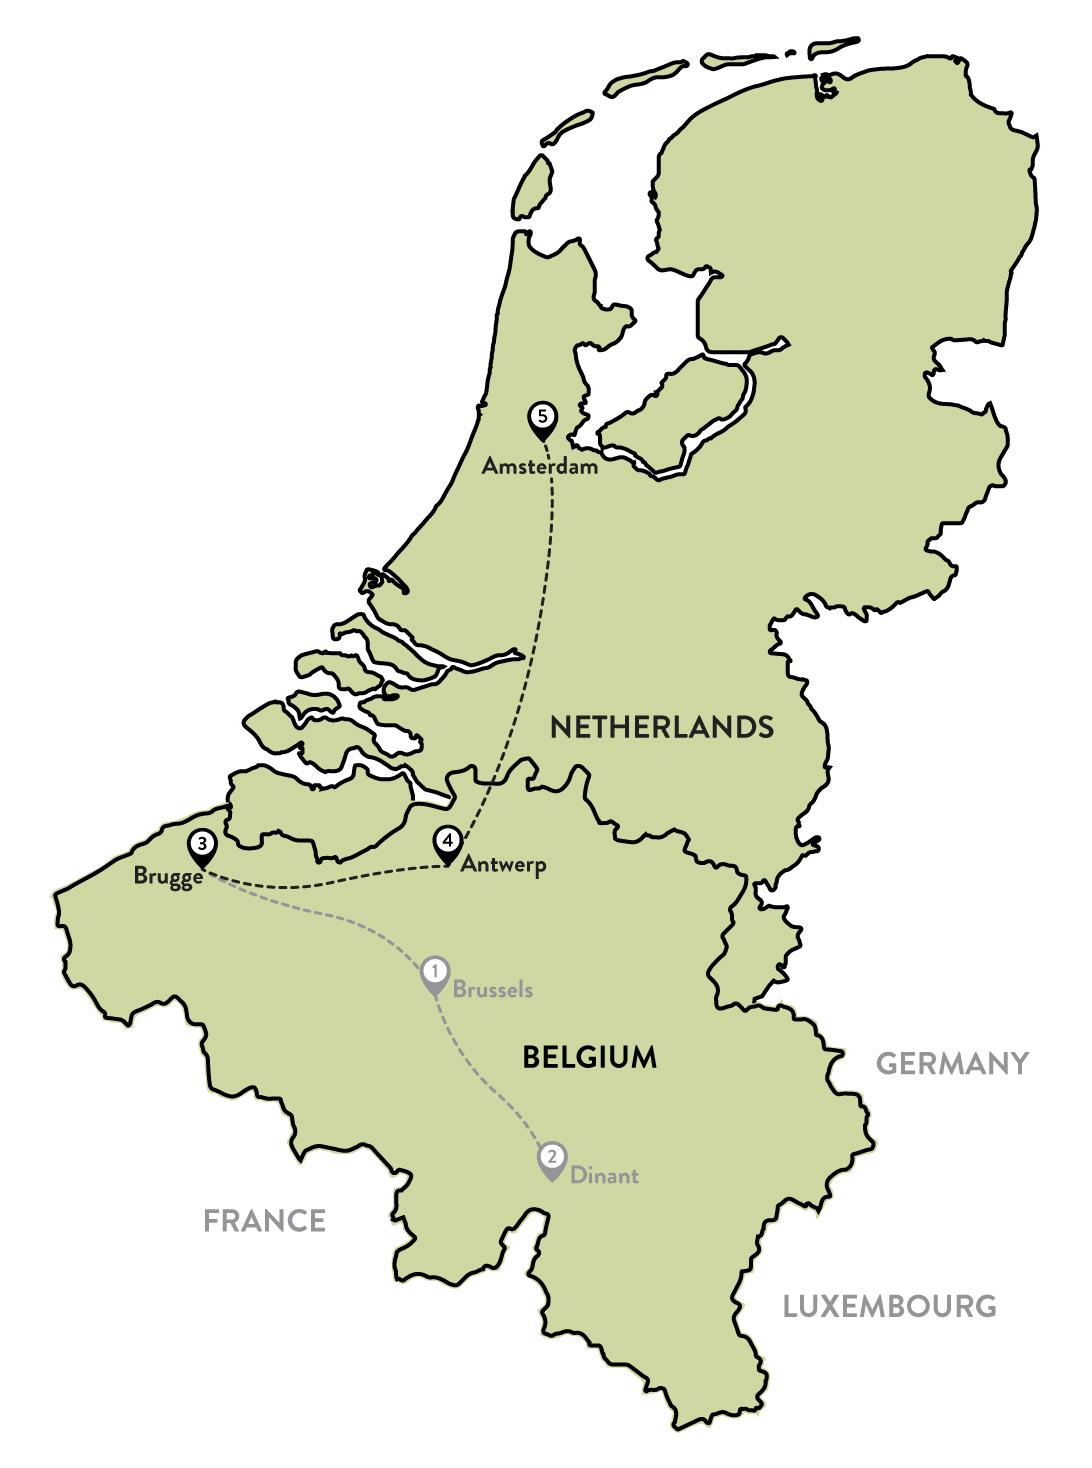 Belgium Part 2 Bruges Antwerp then onto the Netherlands Worth